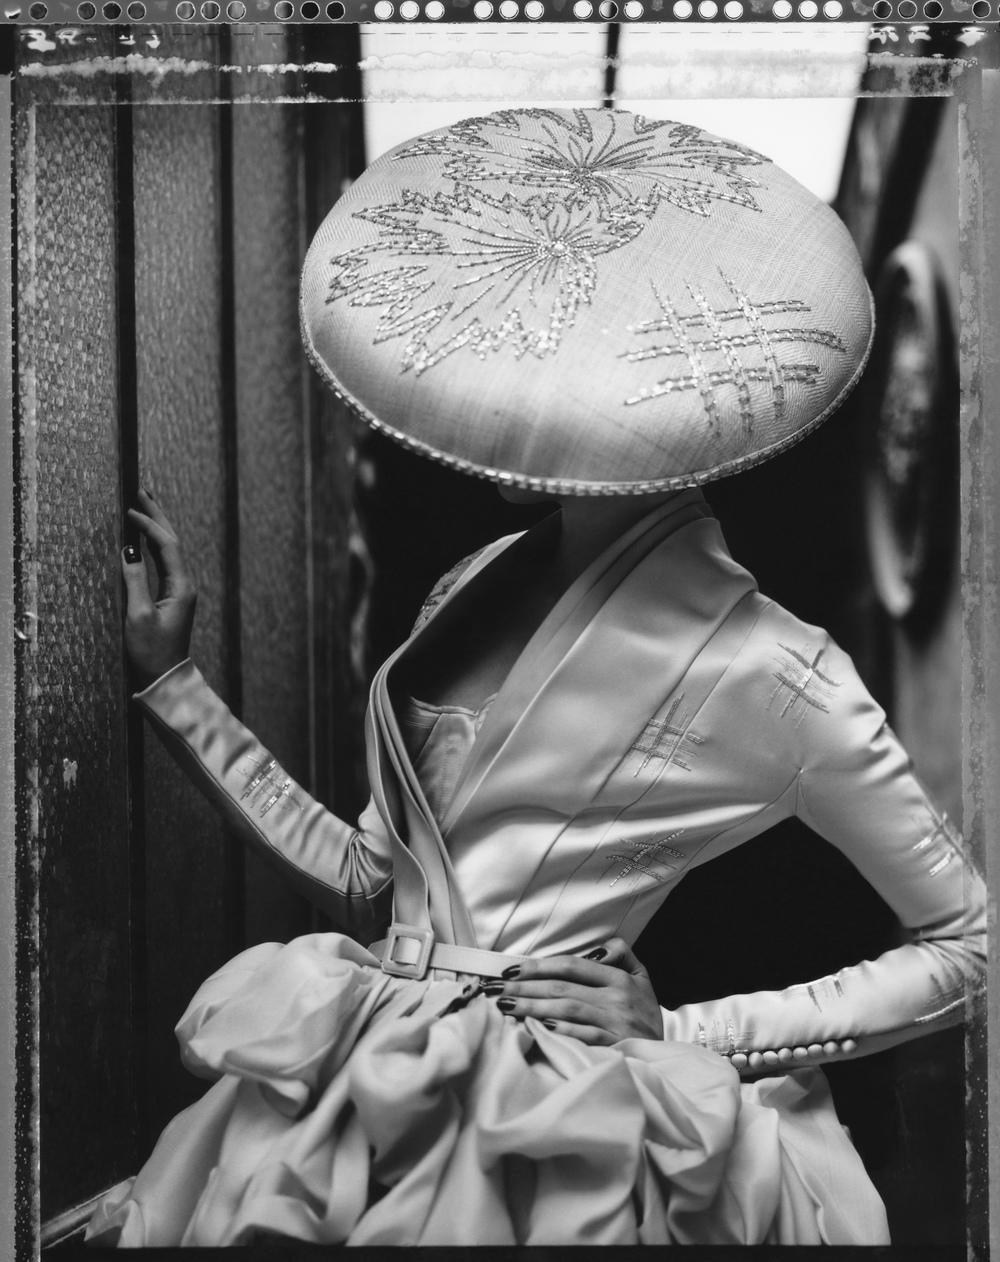 LA FILLE EN PLÂTRE VIII, DIOR – HAUTE COUTURE SUMMER 2007, 2009.Gelatin silver print, 24 x 20 inches (61 x 50.8 cm).© Cathleen Naundorf / Courtesy Edwynn Houk Gallery, New York & Zürich